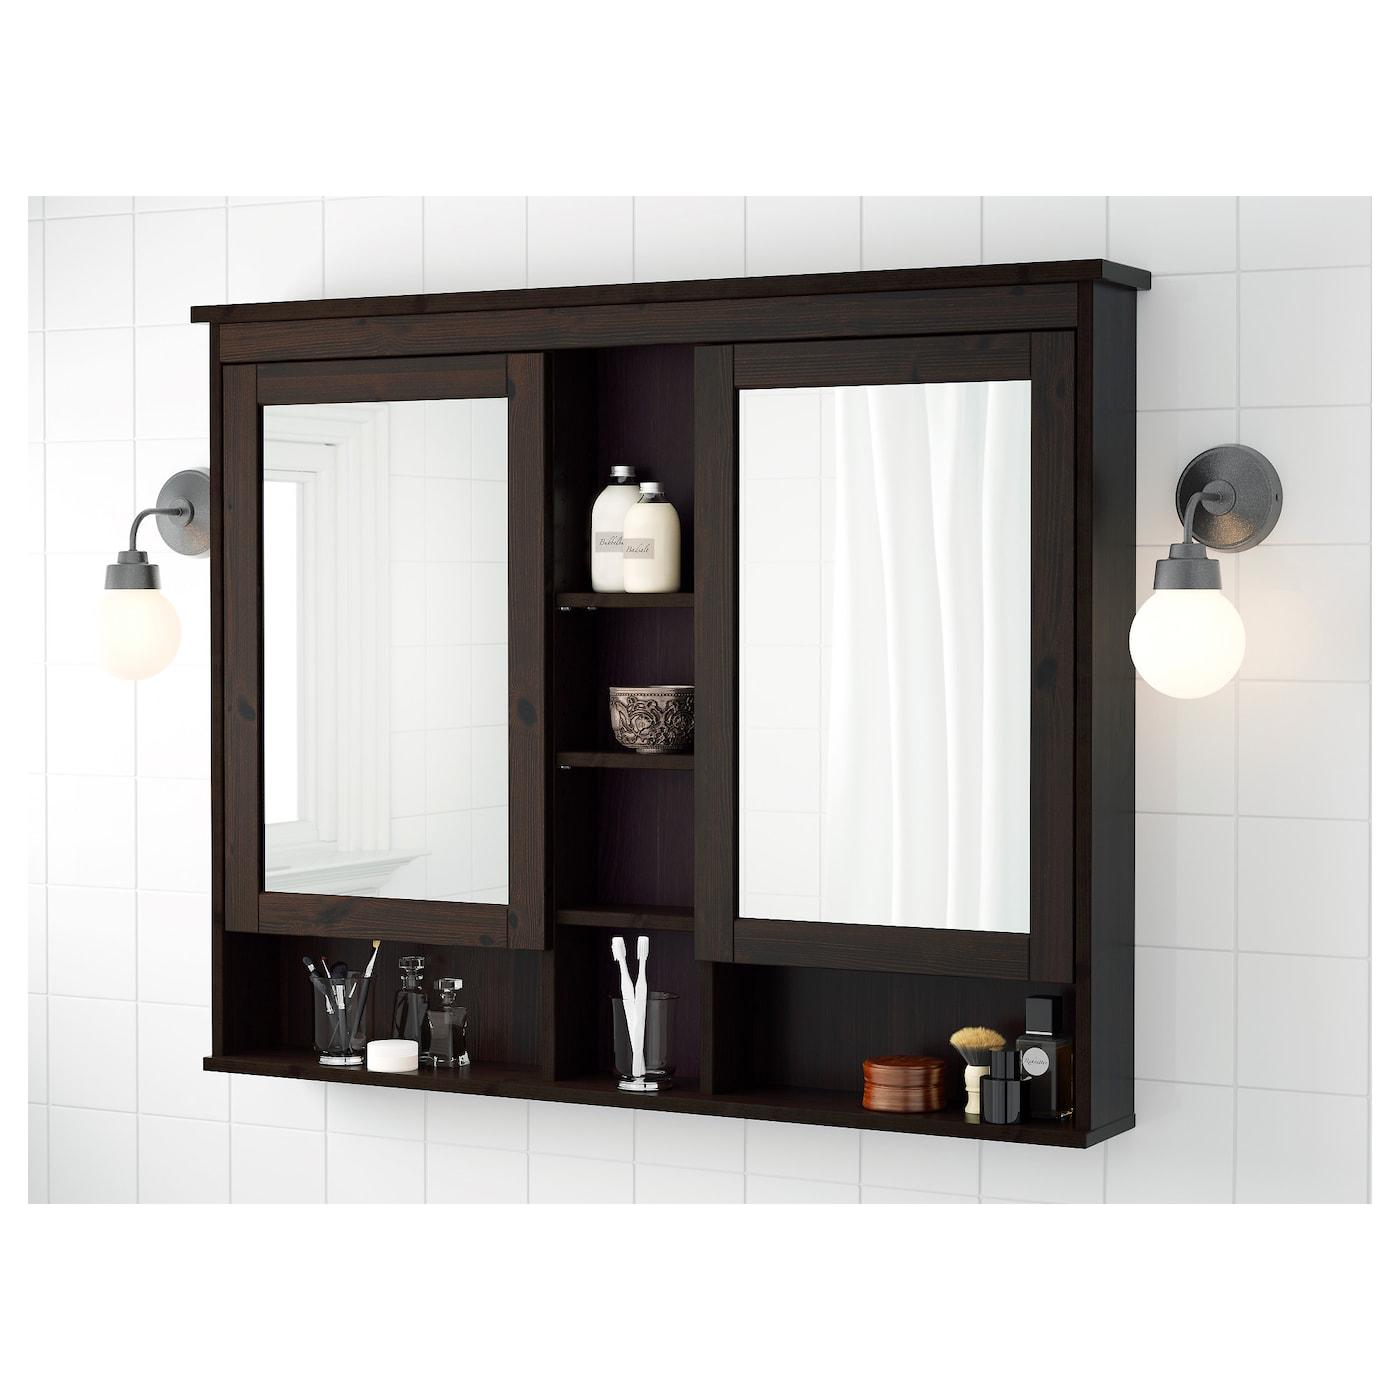 Admirable Hemnes Mirror Cabinet With 2 Doors Black Brown Stain Download Free Architecture Designs Scobabritishbridgeorg